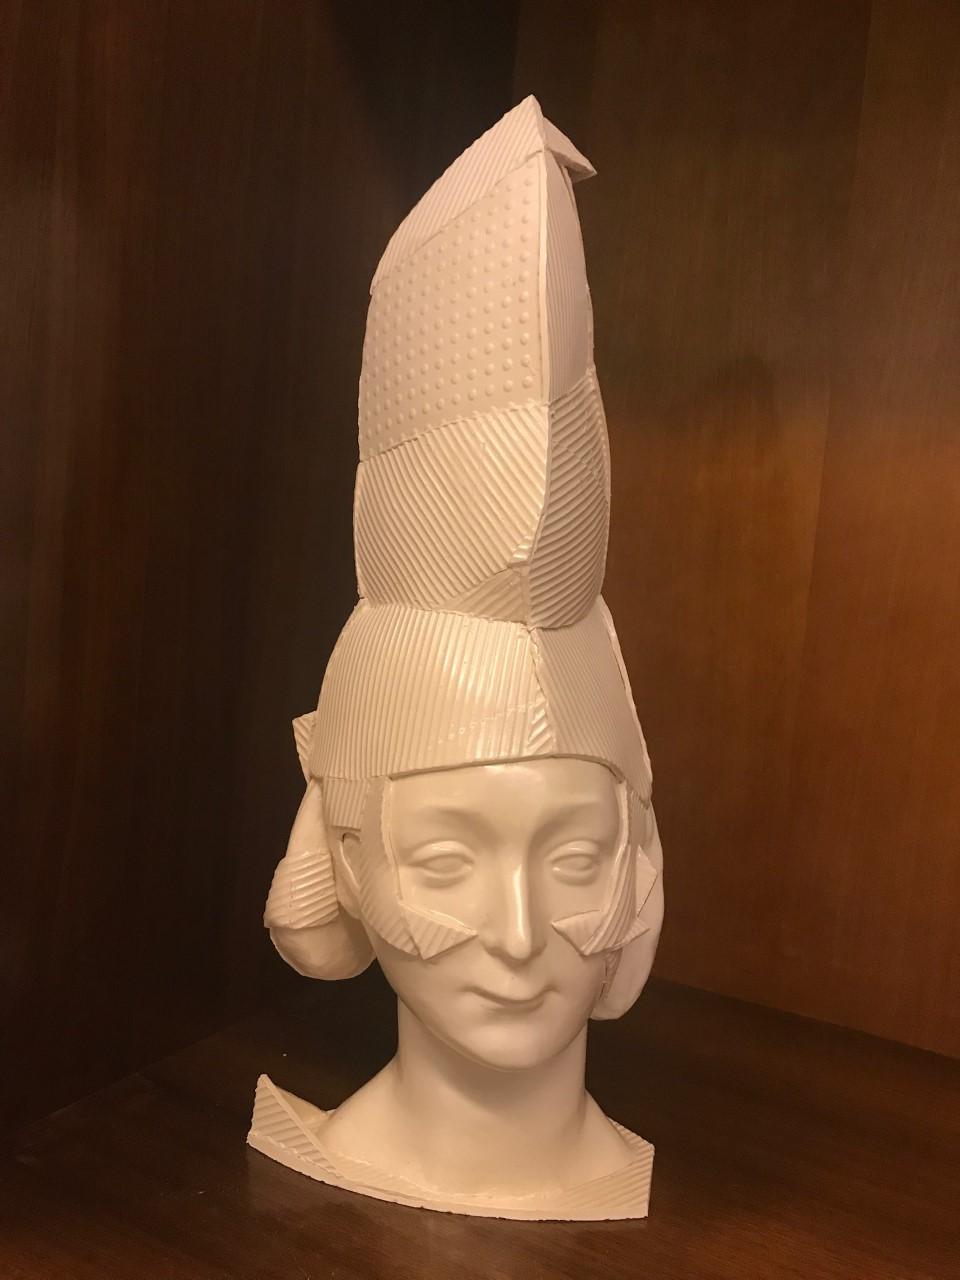 Ihor mujer con casco